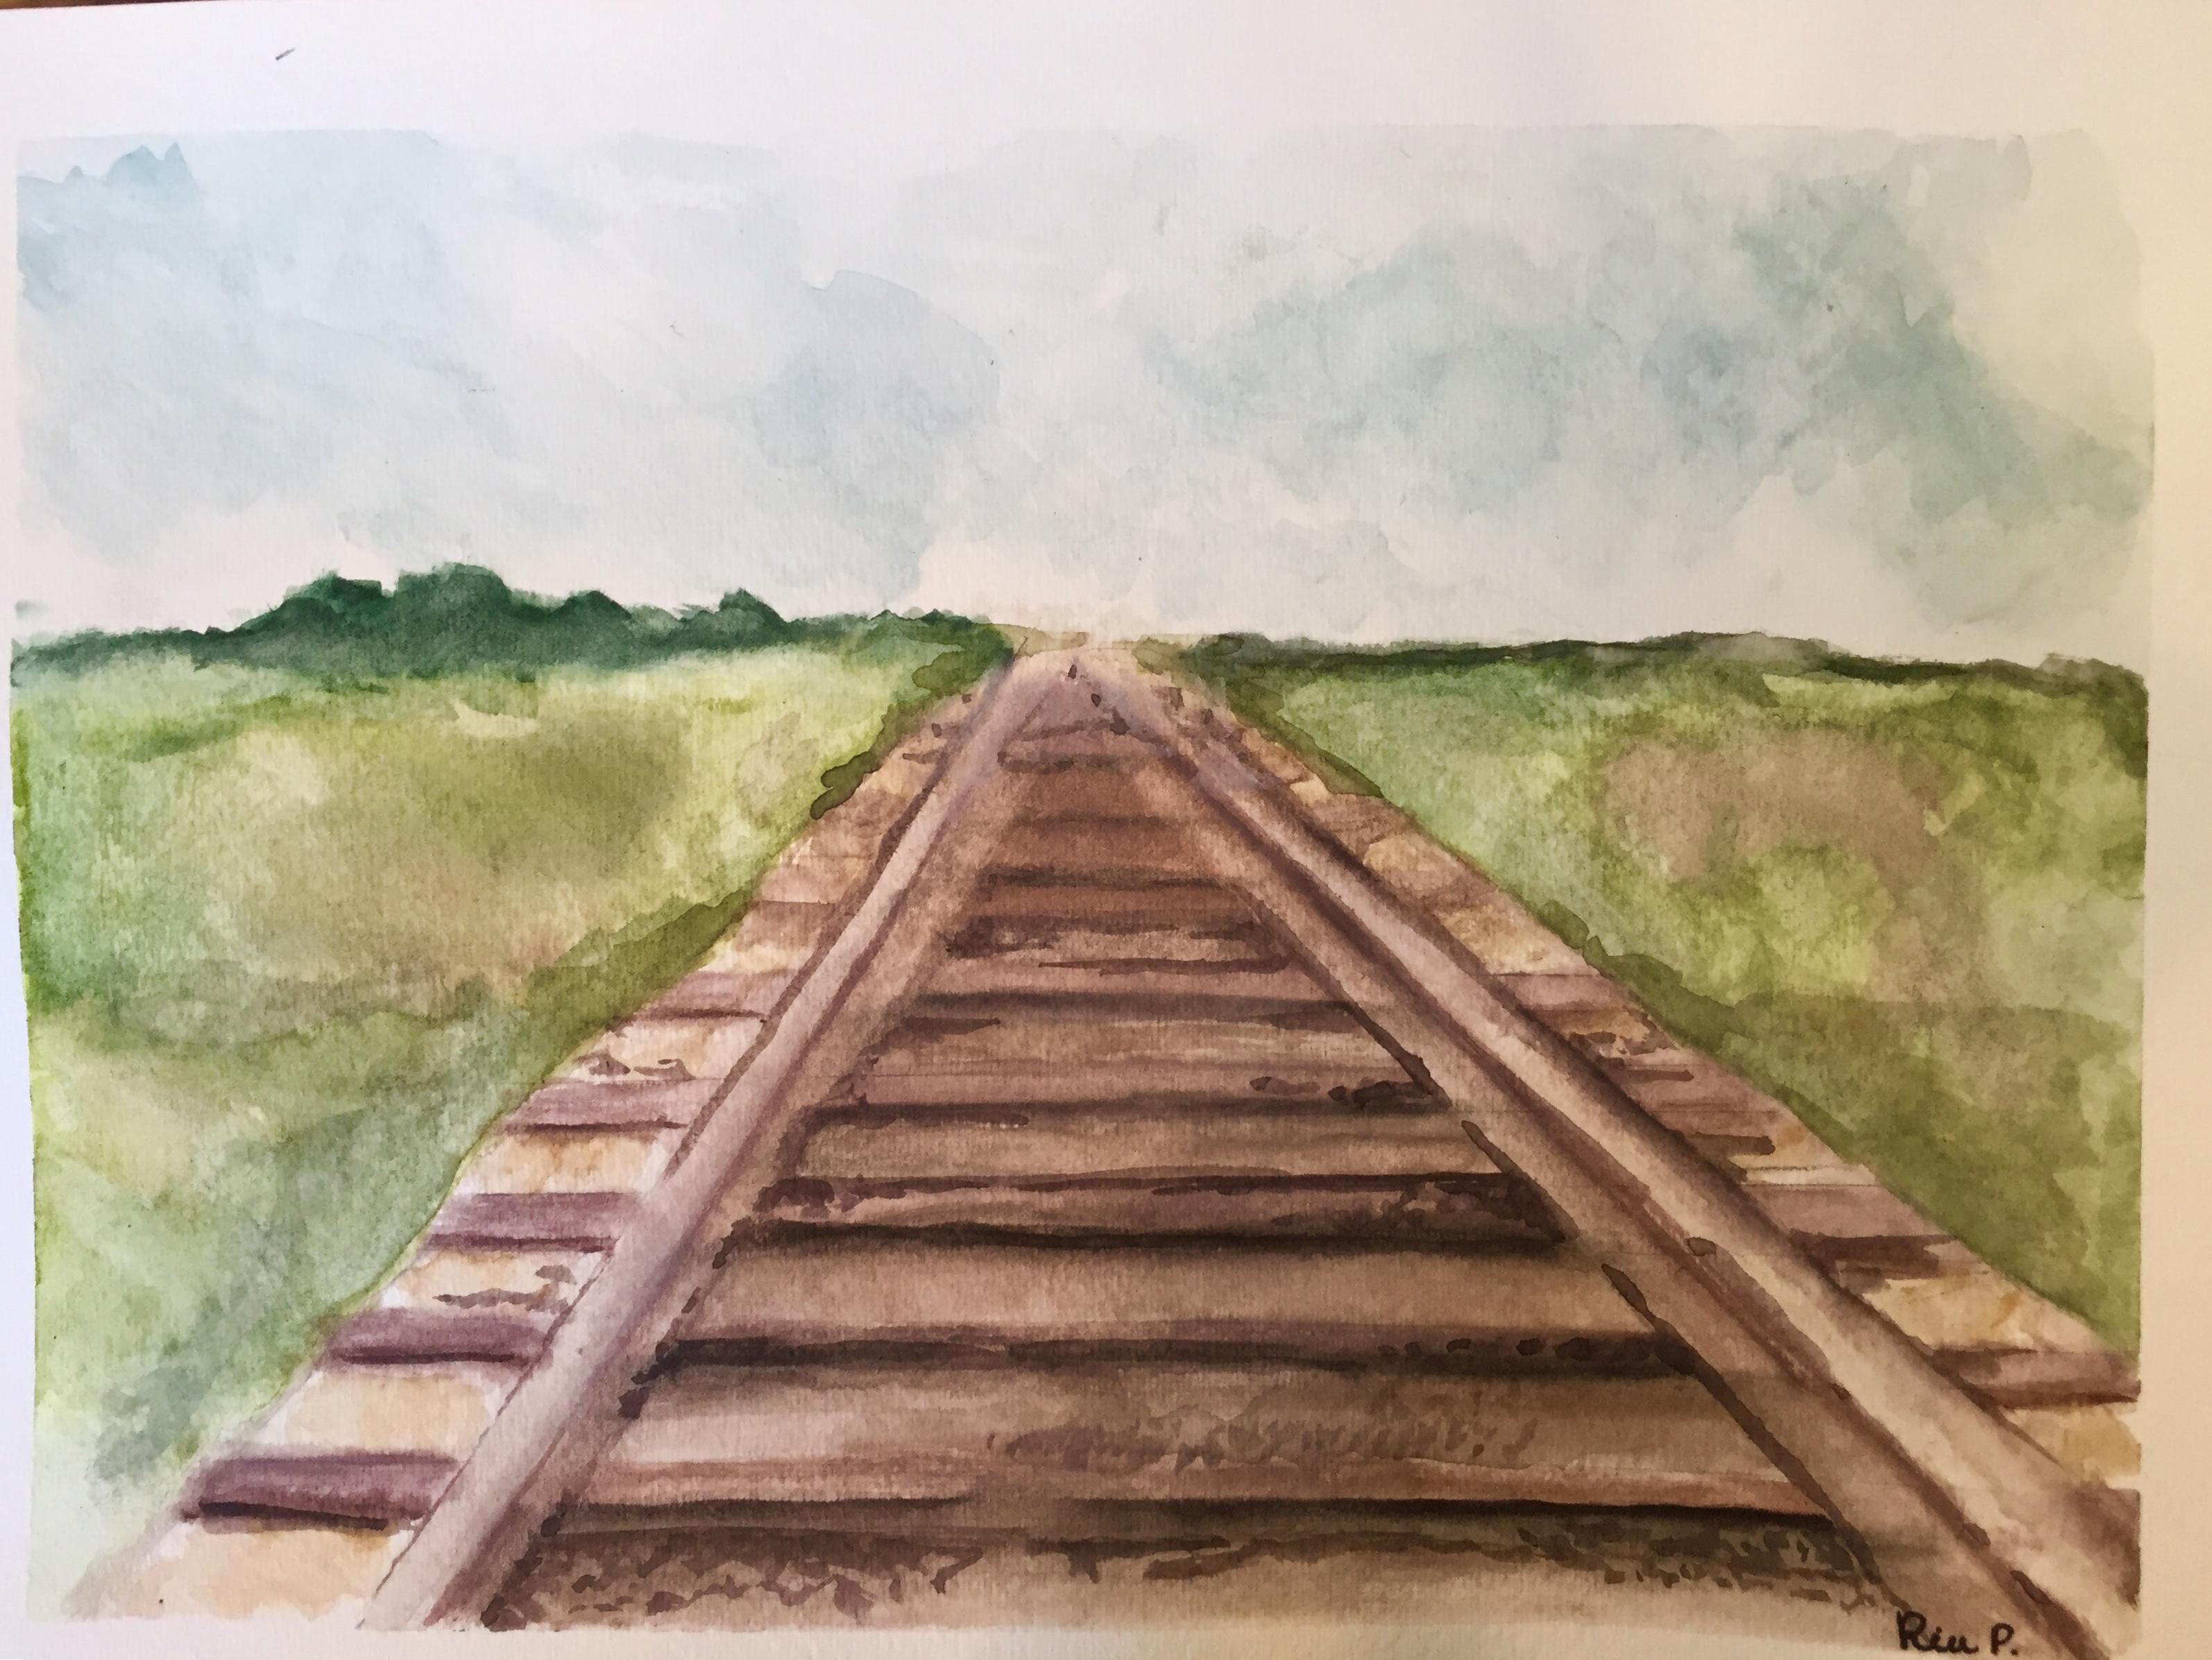 Ria's Train Tracks